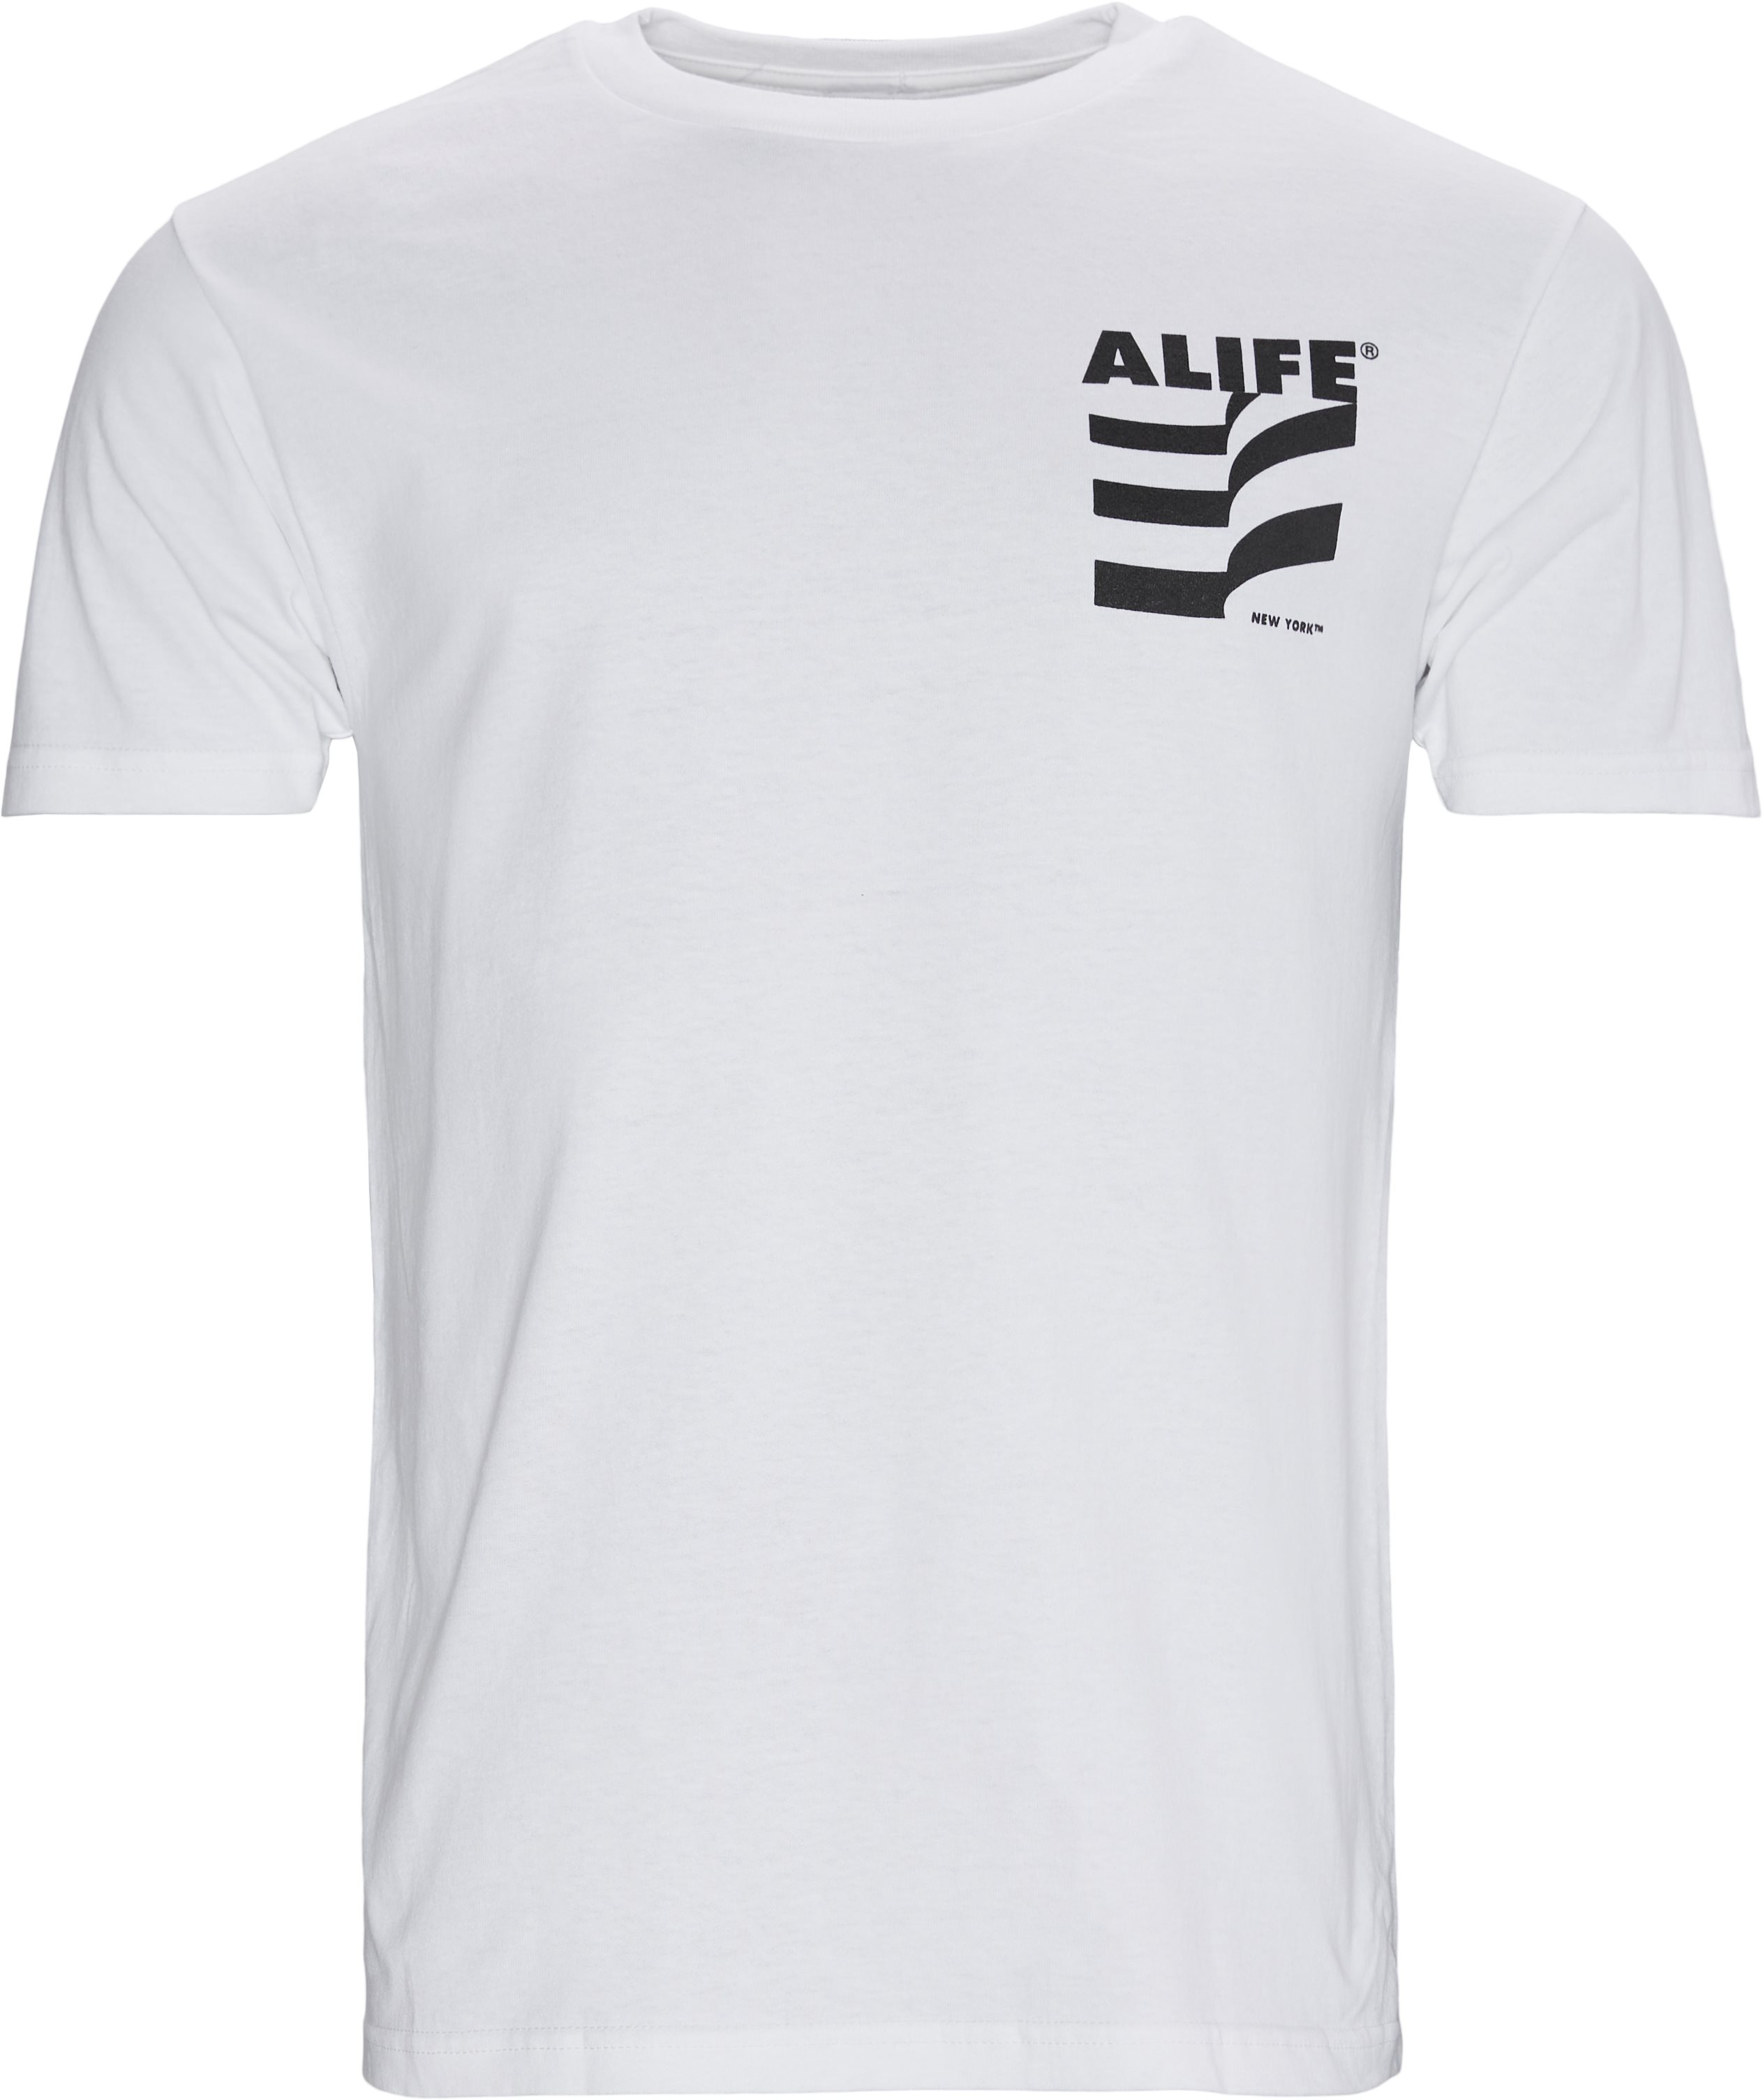 Museum Tee - T-shirts - Regular - Vit